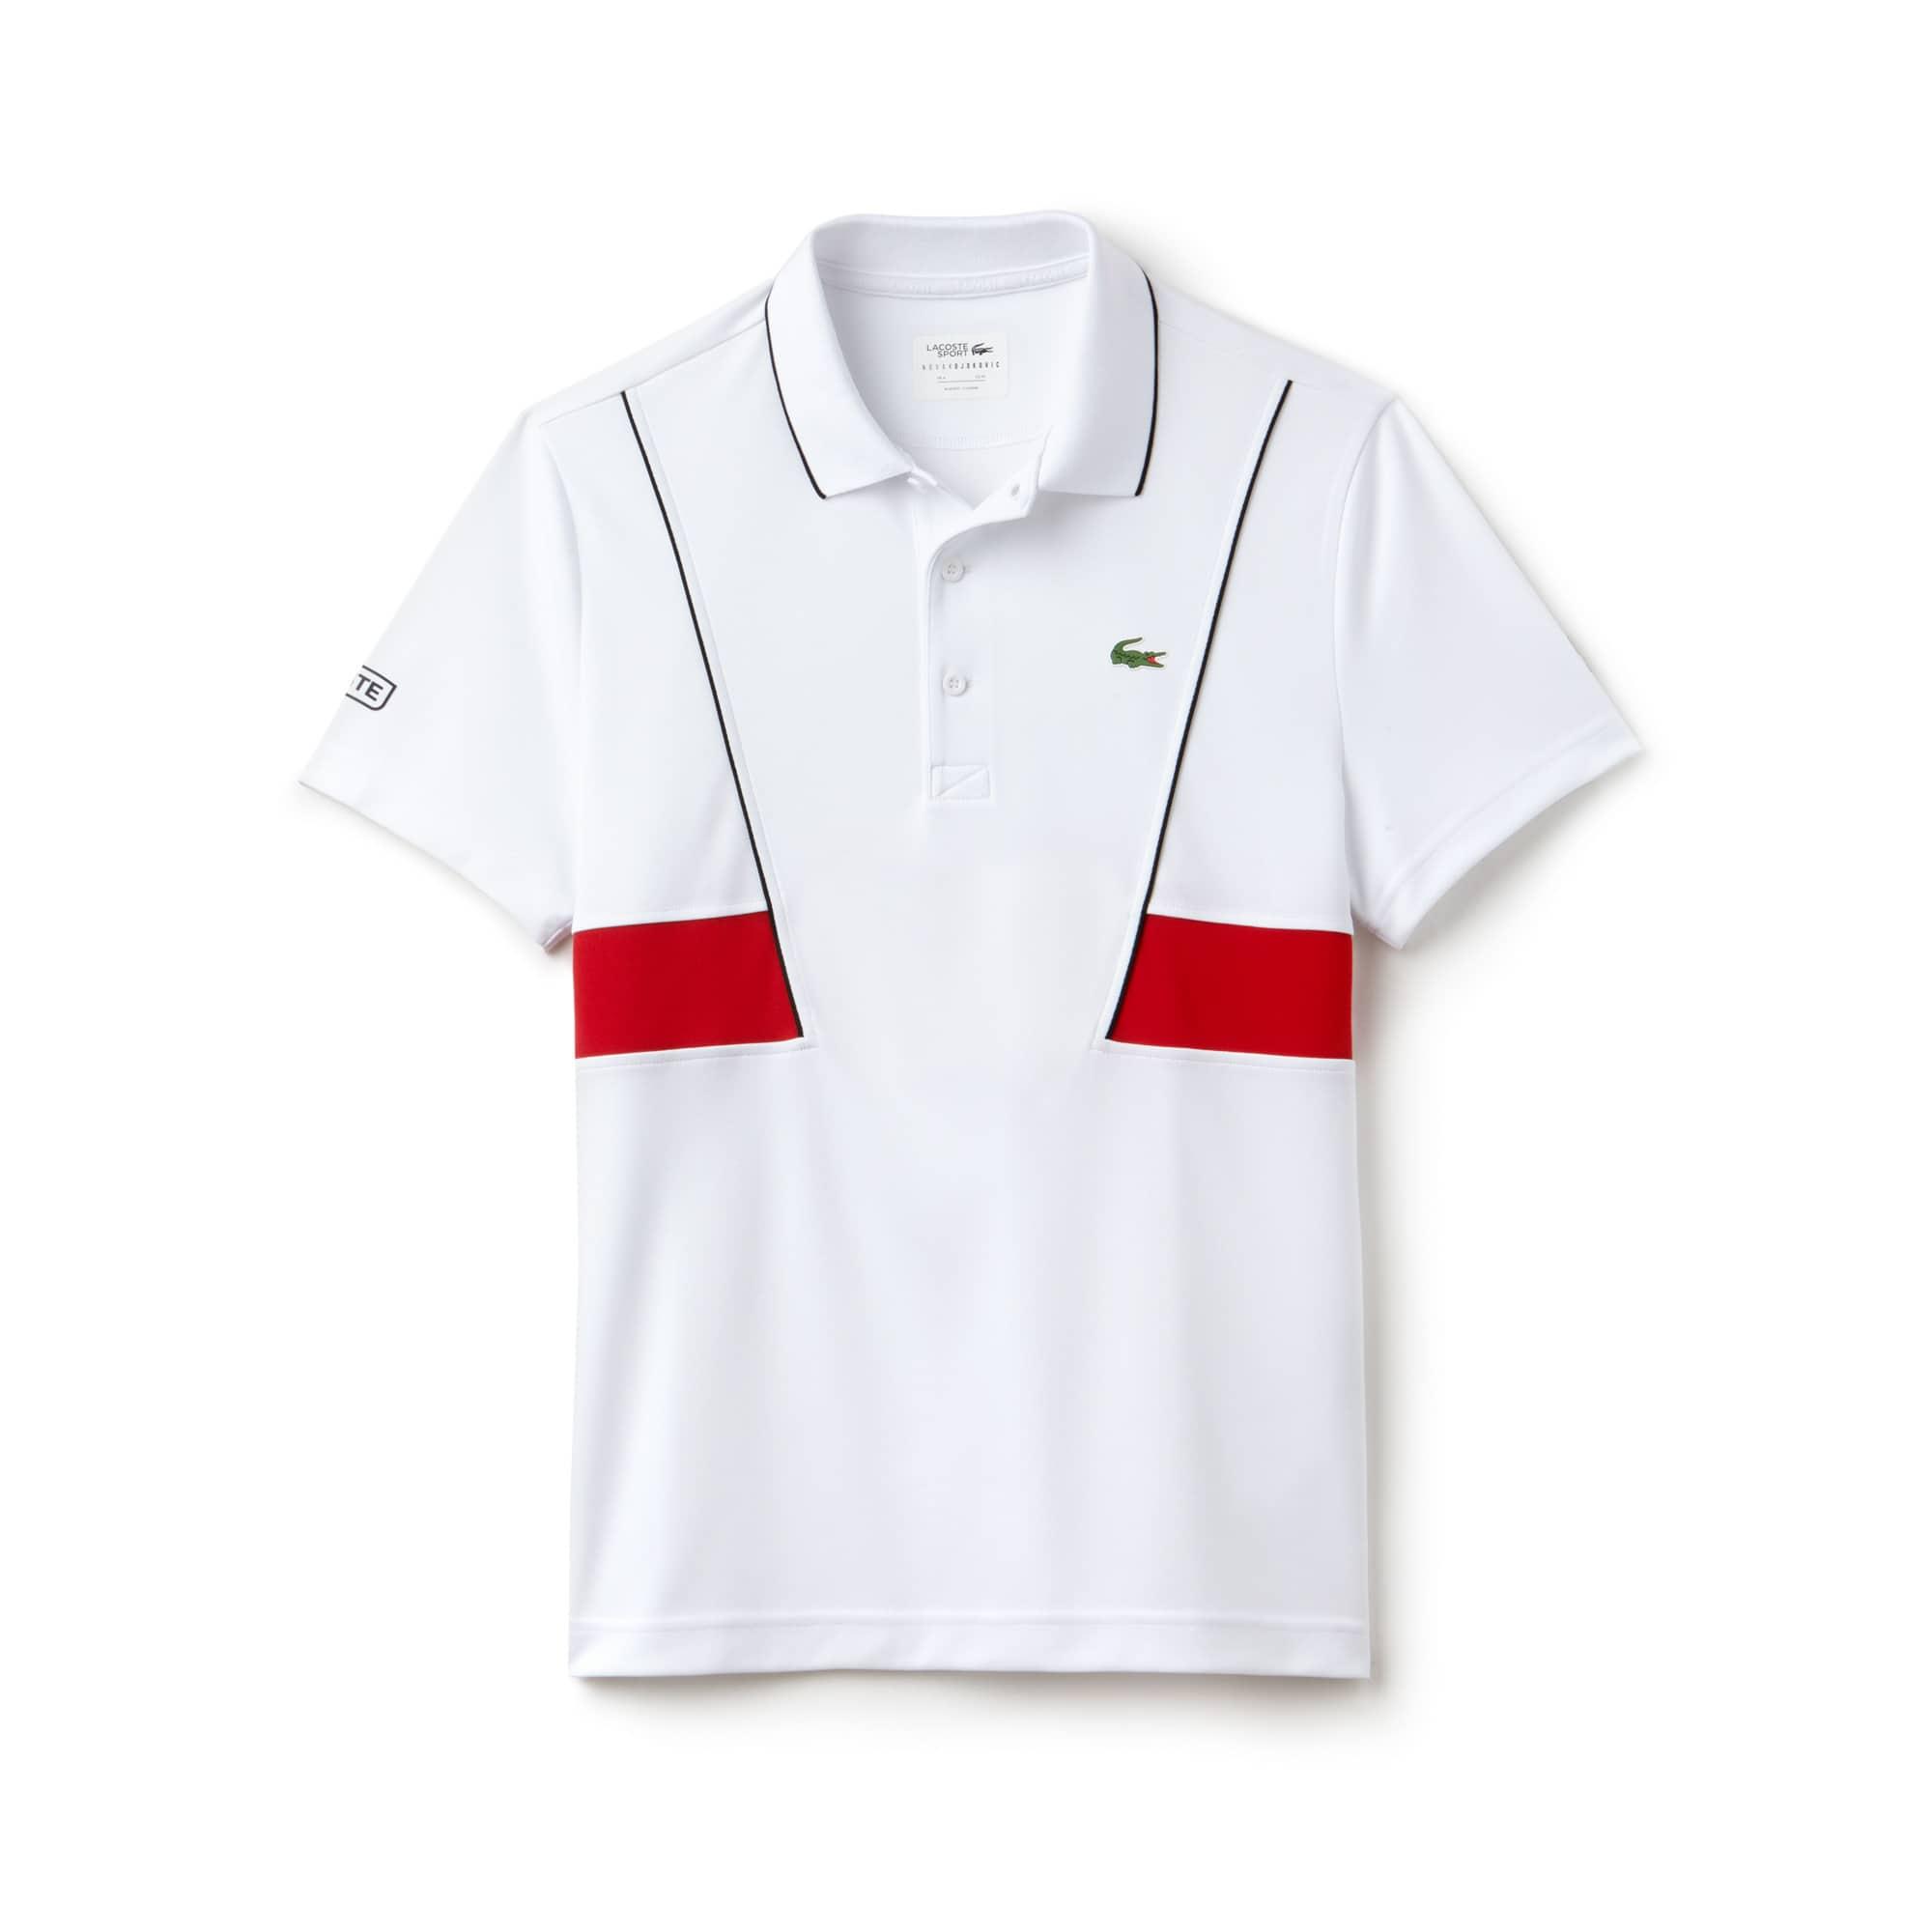 Herren LACOSTE SPORT NOVAK DJOKOVIC COLLECTION Poloshirt